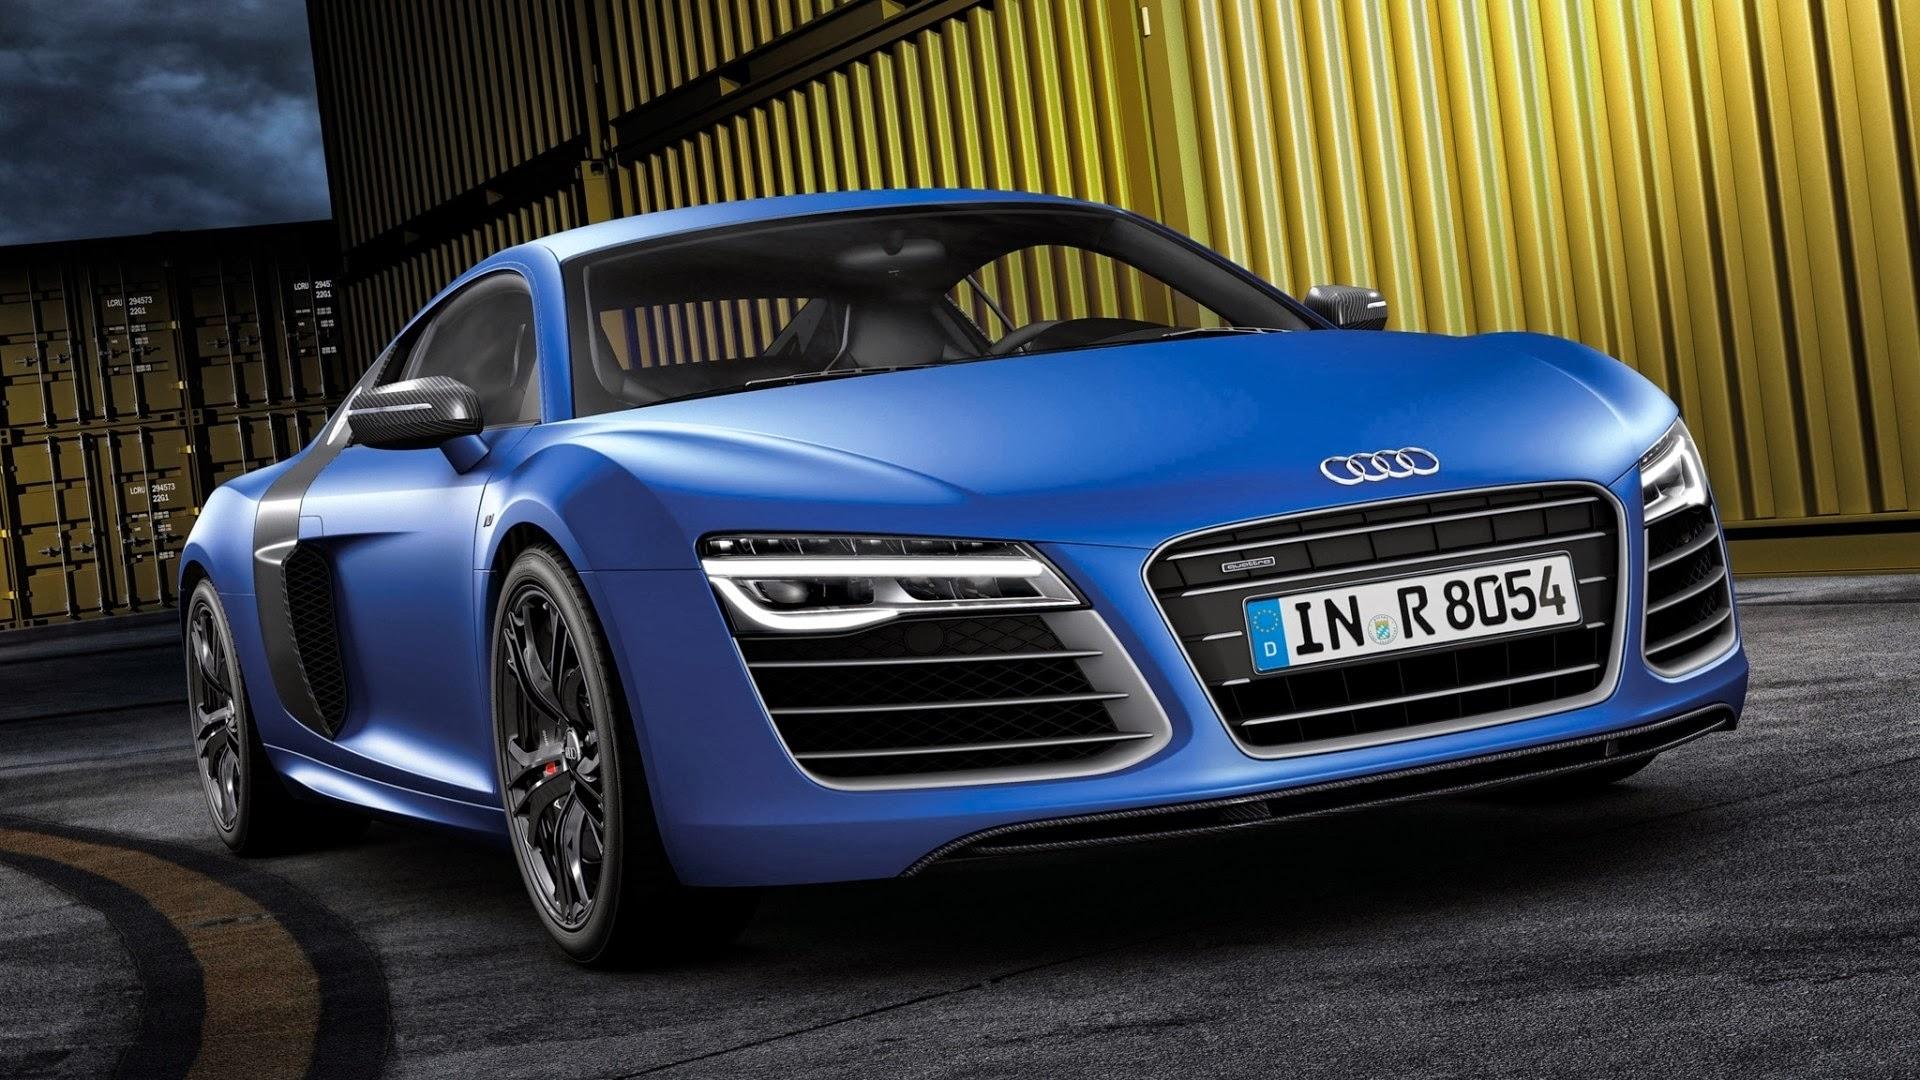 Audi-R8-V10-Carros-Deportivos-1920x1080.jpg